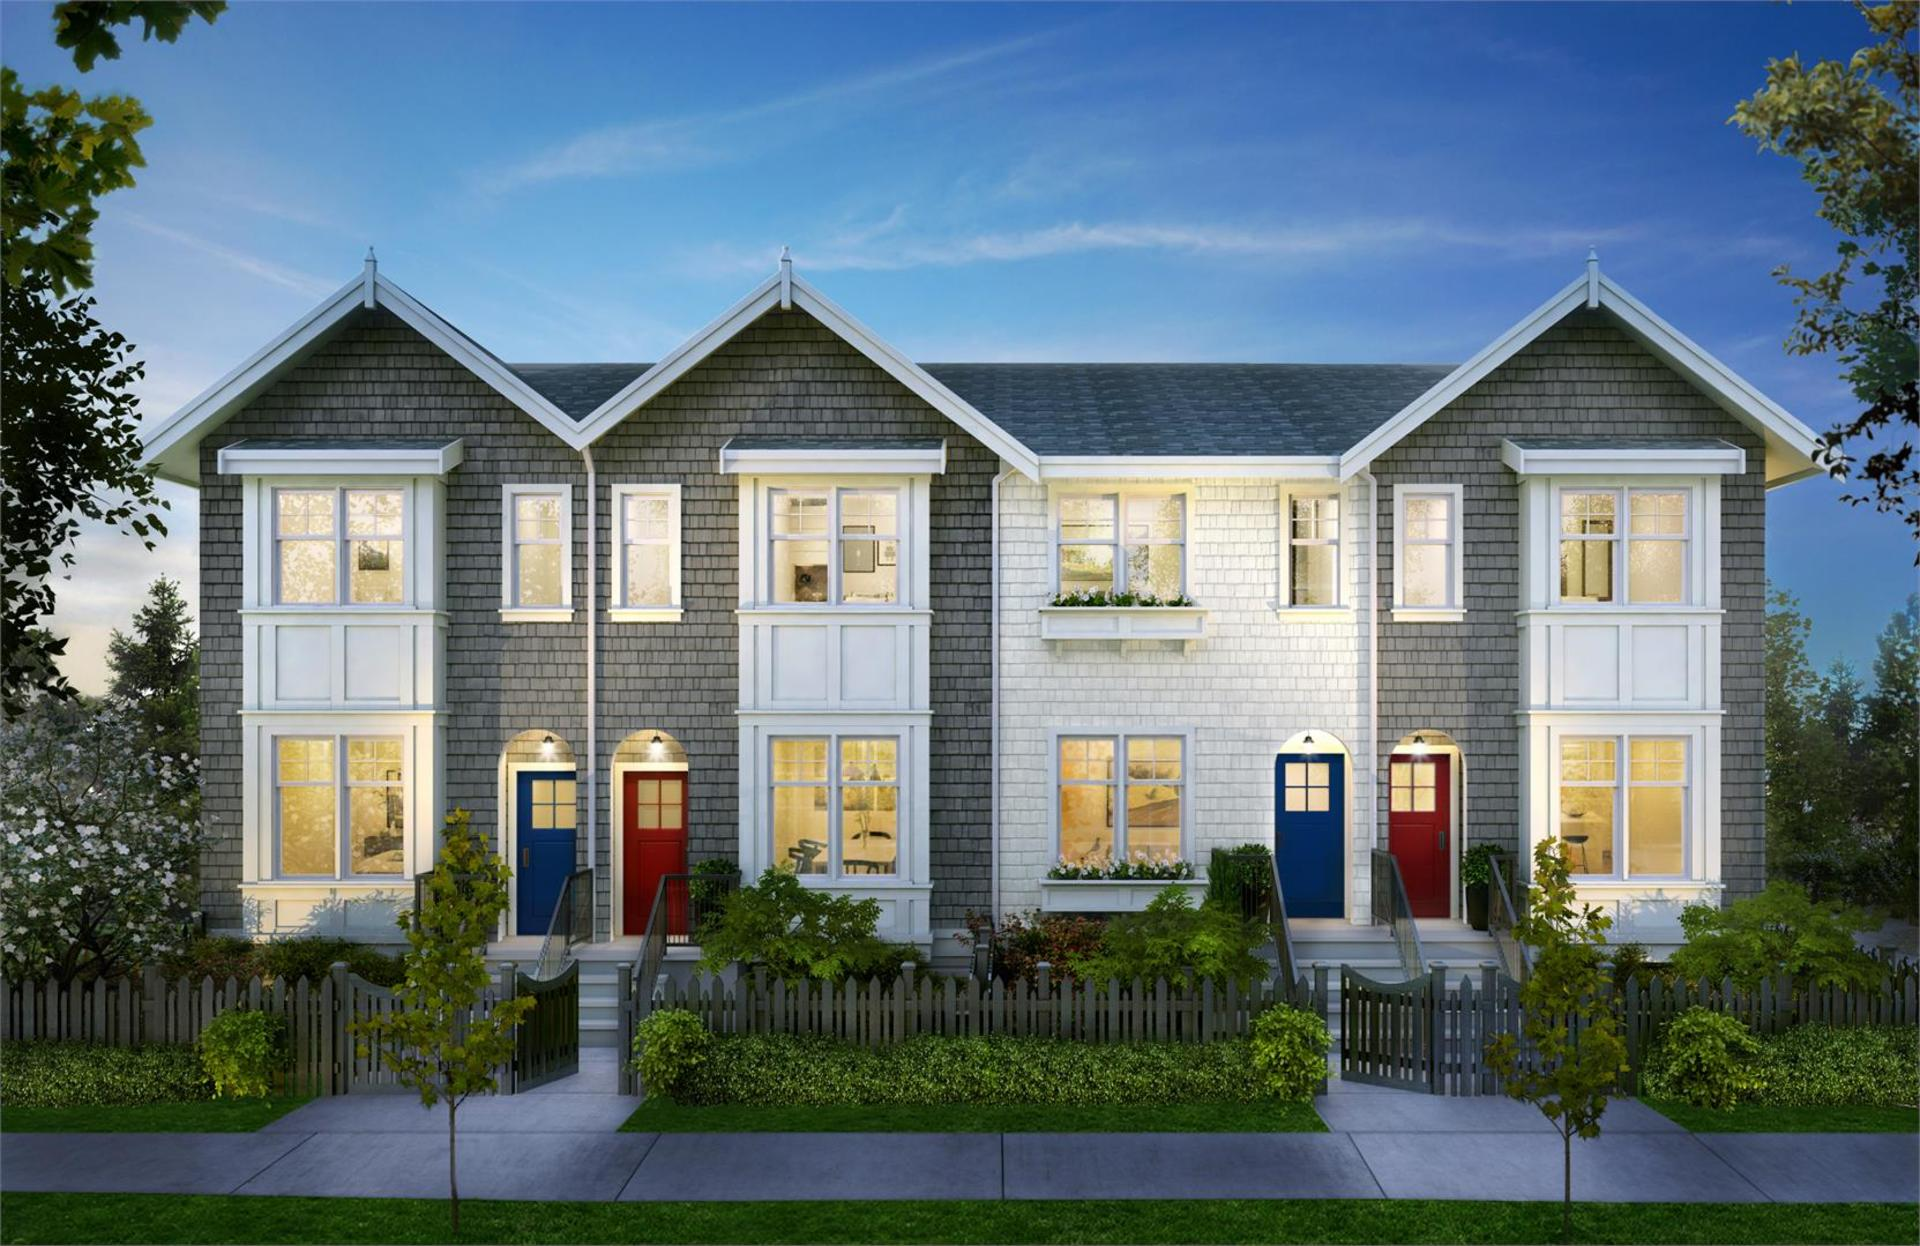 sutherland-townhomes at Sutherland Townhomes (2824 St. George Street, Port Moody Centre, Port Moody)